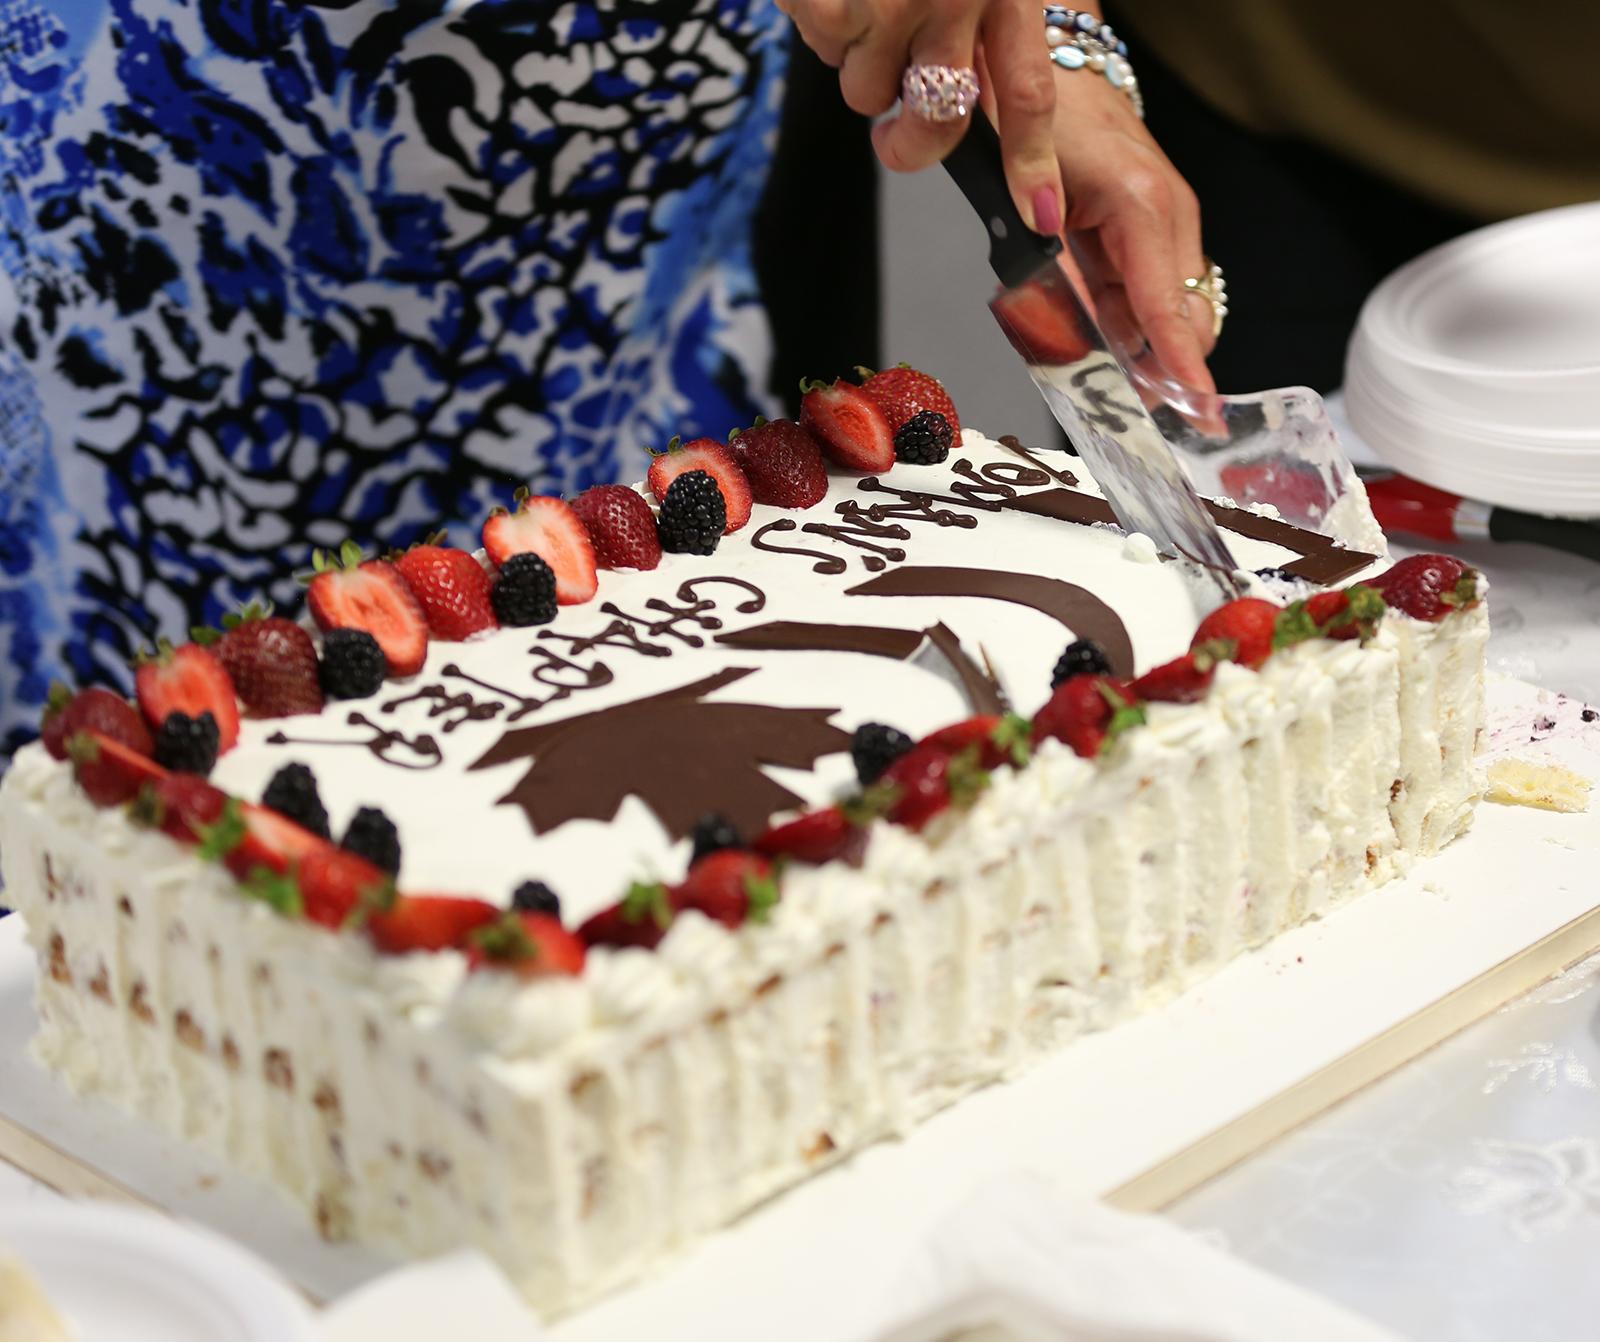 TCCC Women's Chapter 1st Anniversary Celebration